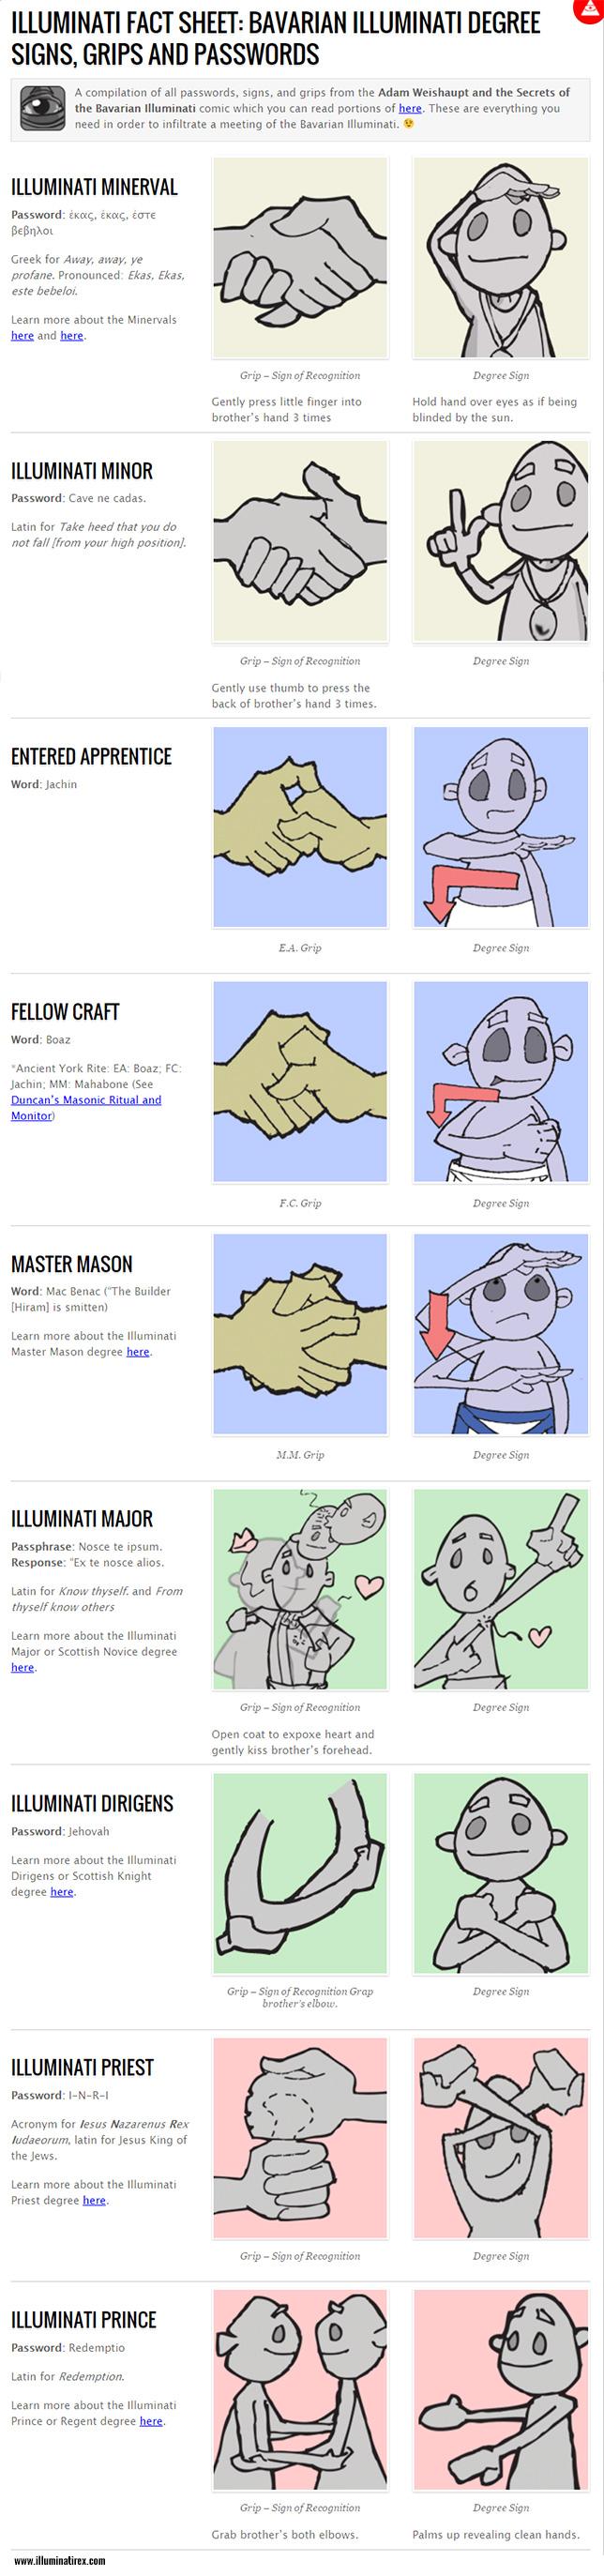 ... Illuminati Secret Handshakes and Hand Signs | Illuminati SymbolsIlluminati All Seeing Eye Celebrities